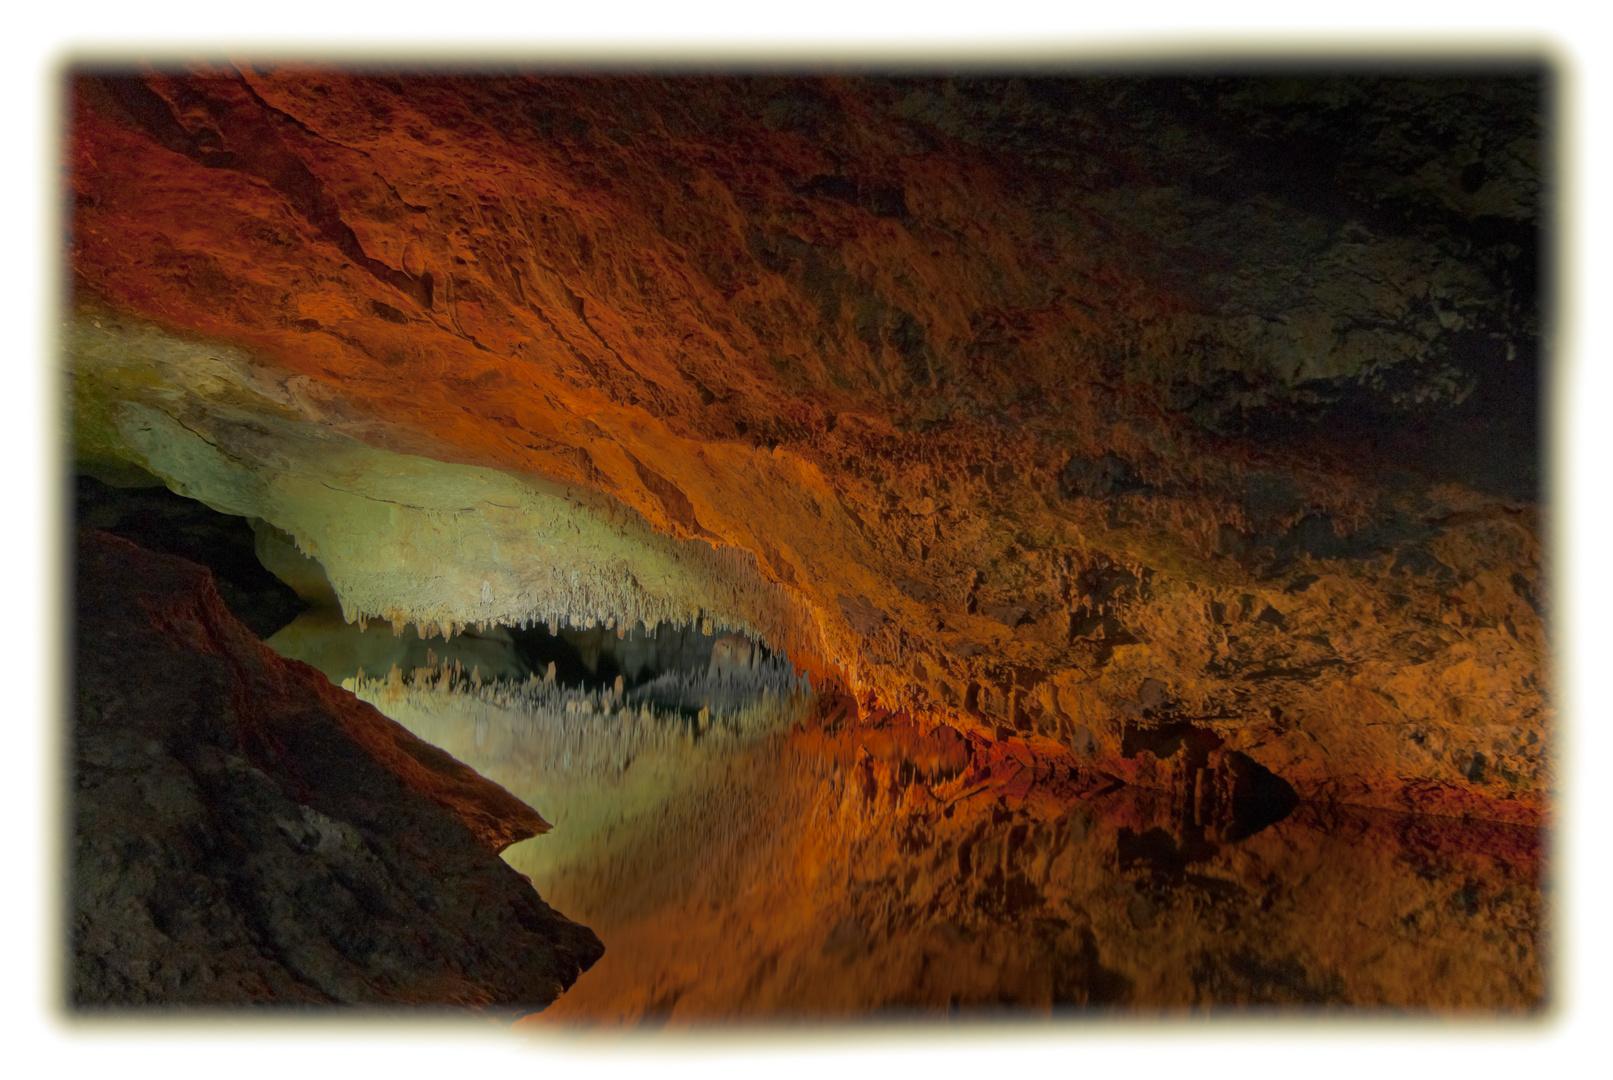 cueva genovesa